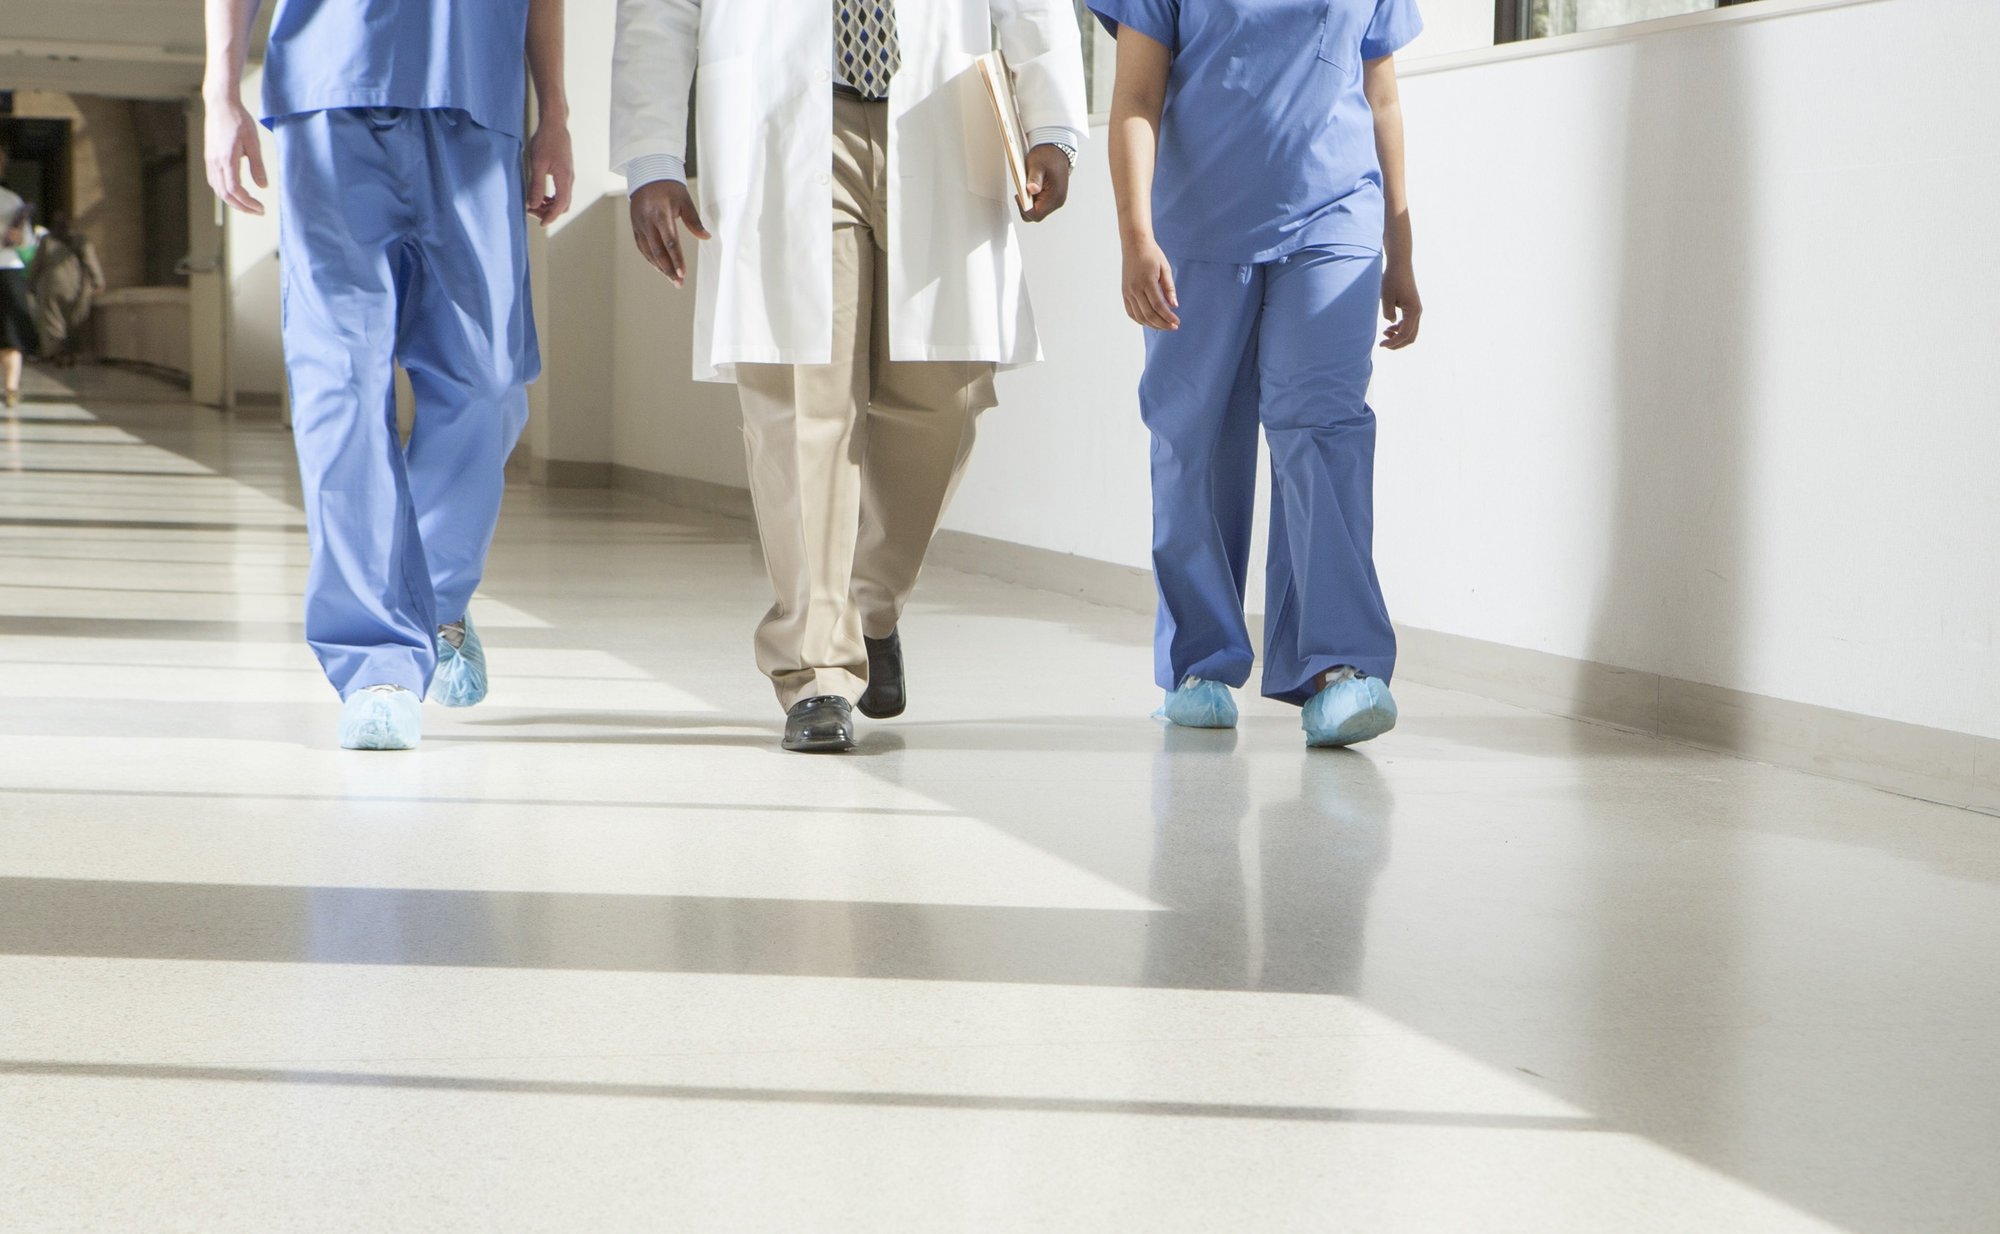 doctors-in-hallway_rtrOz7CSj.jpg